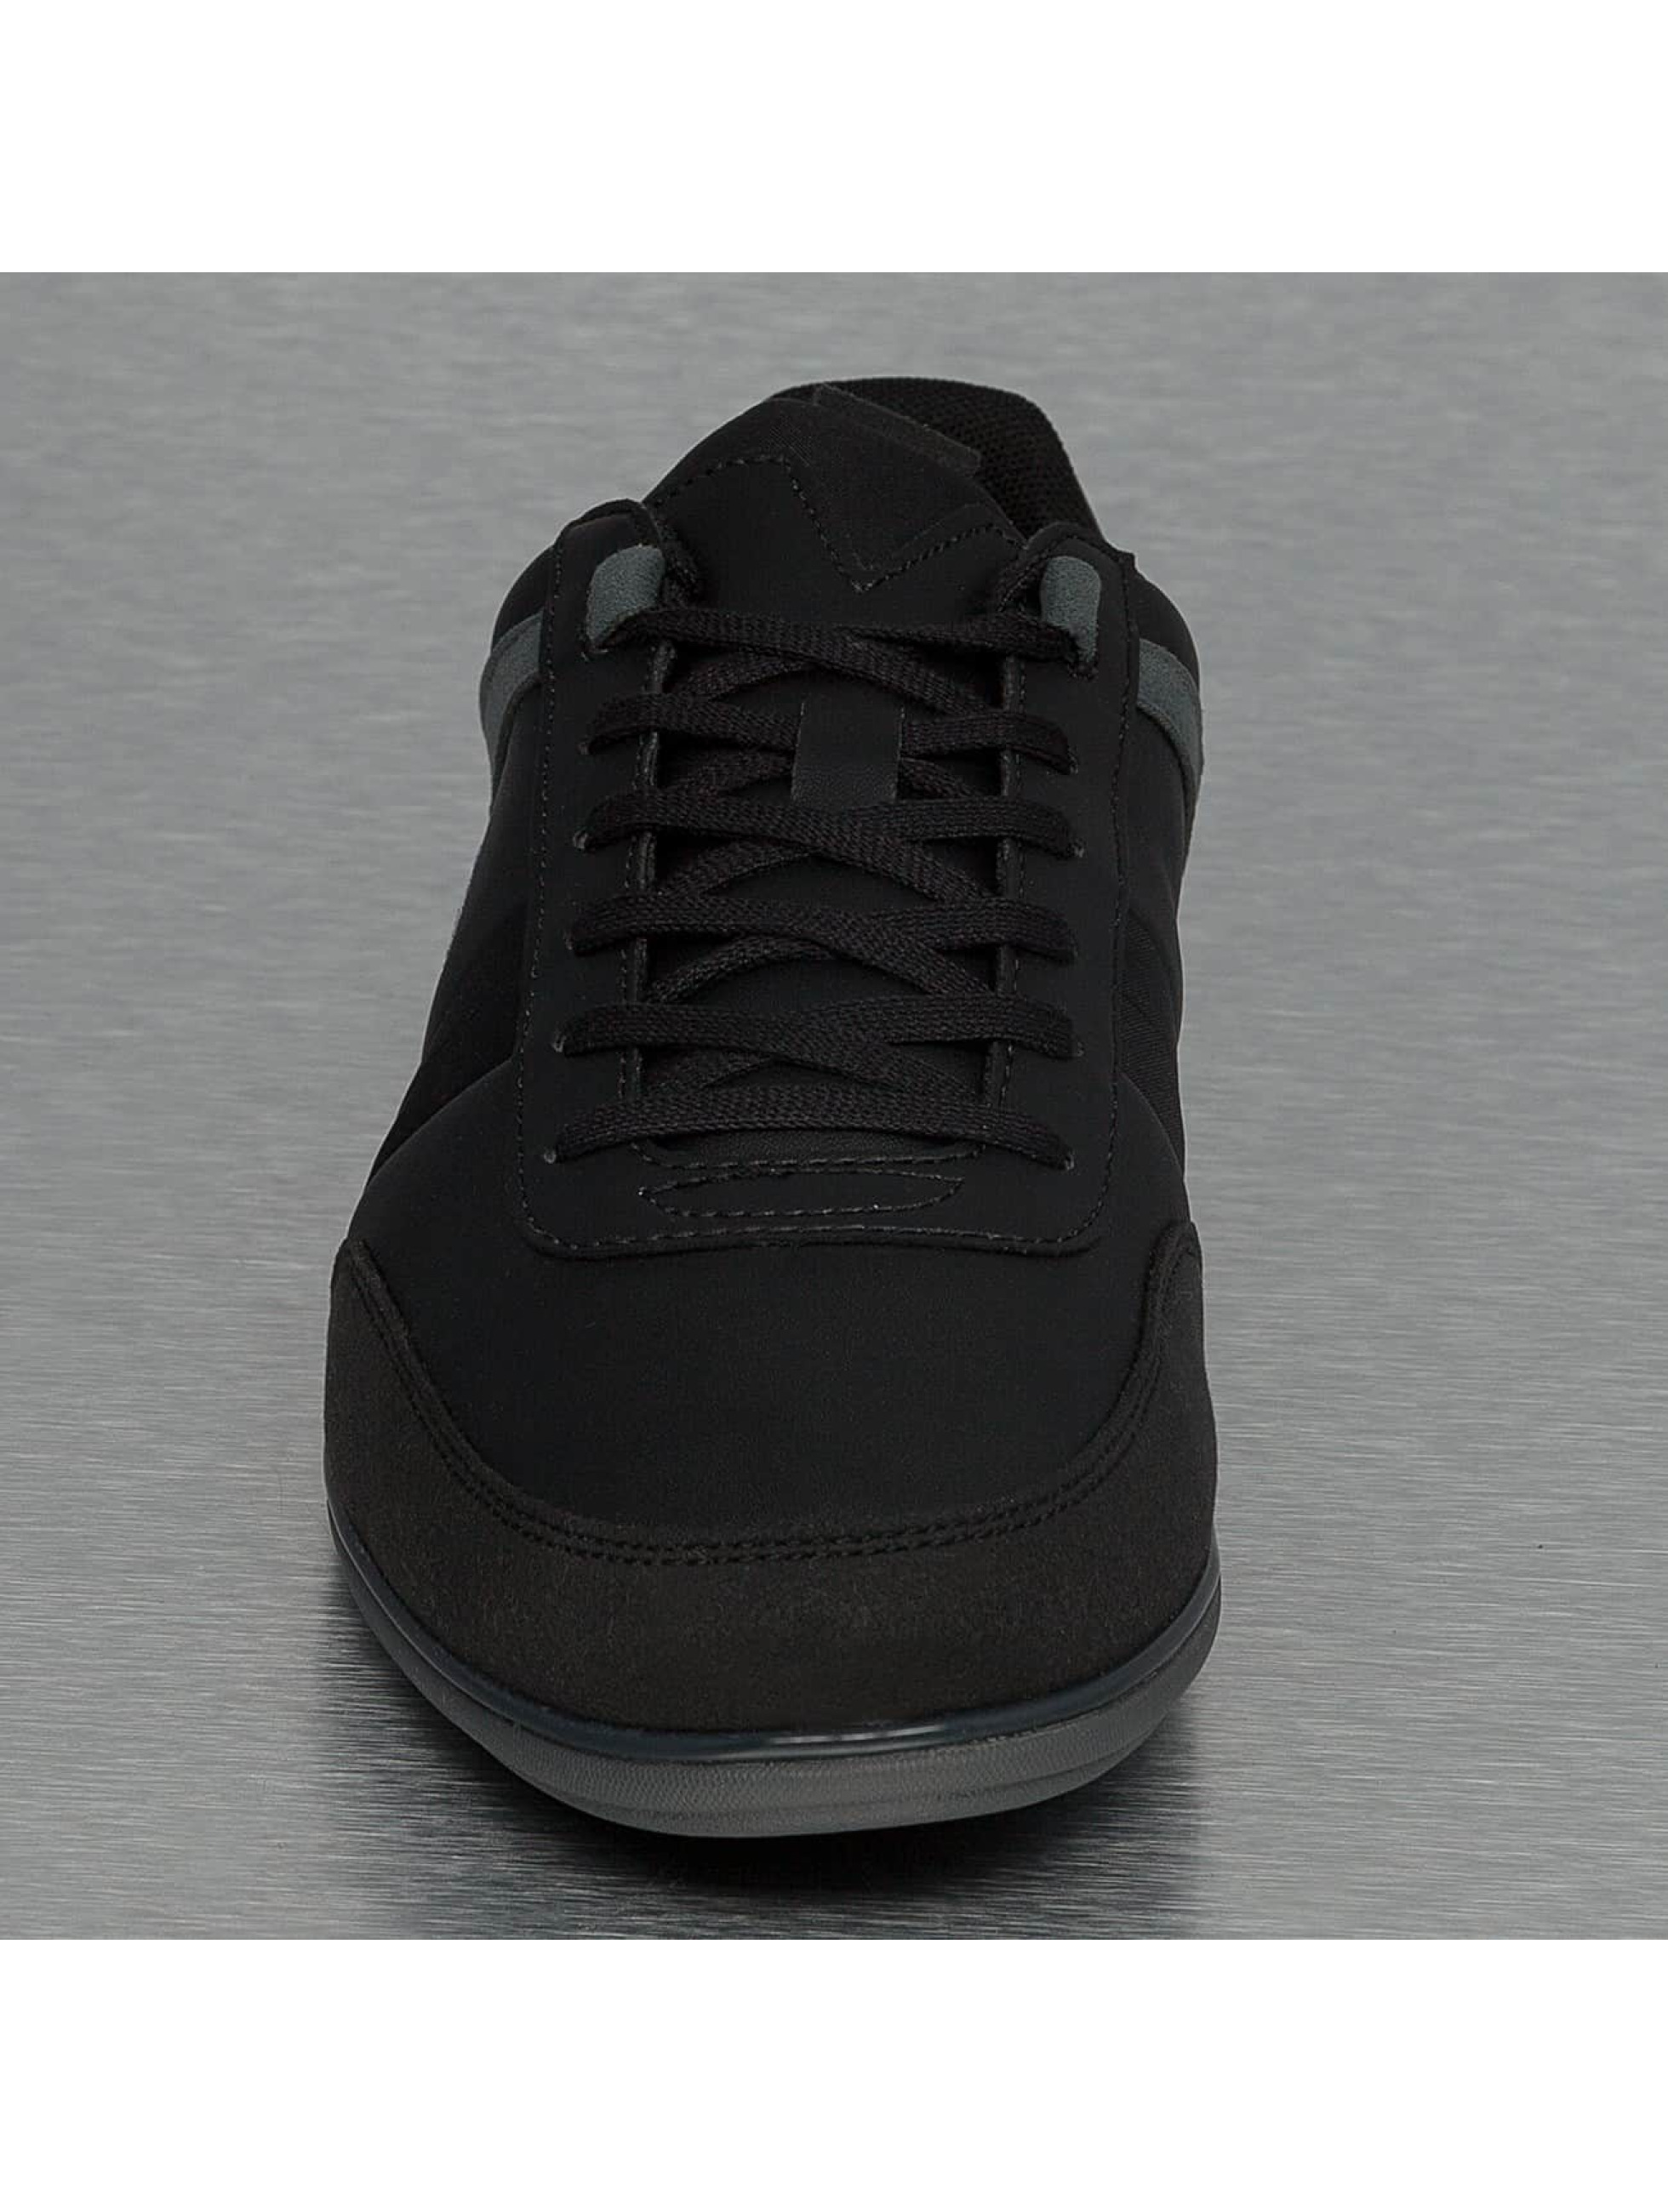 Lacoste Sneakers Girom 316 SPM black